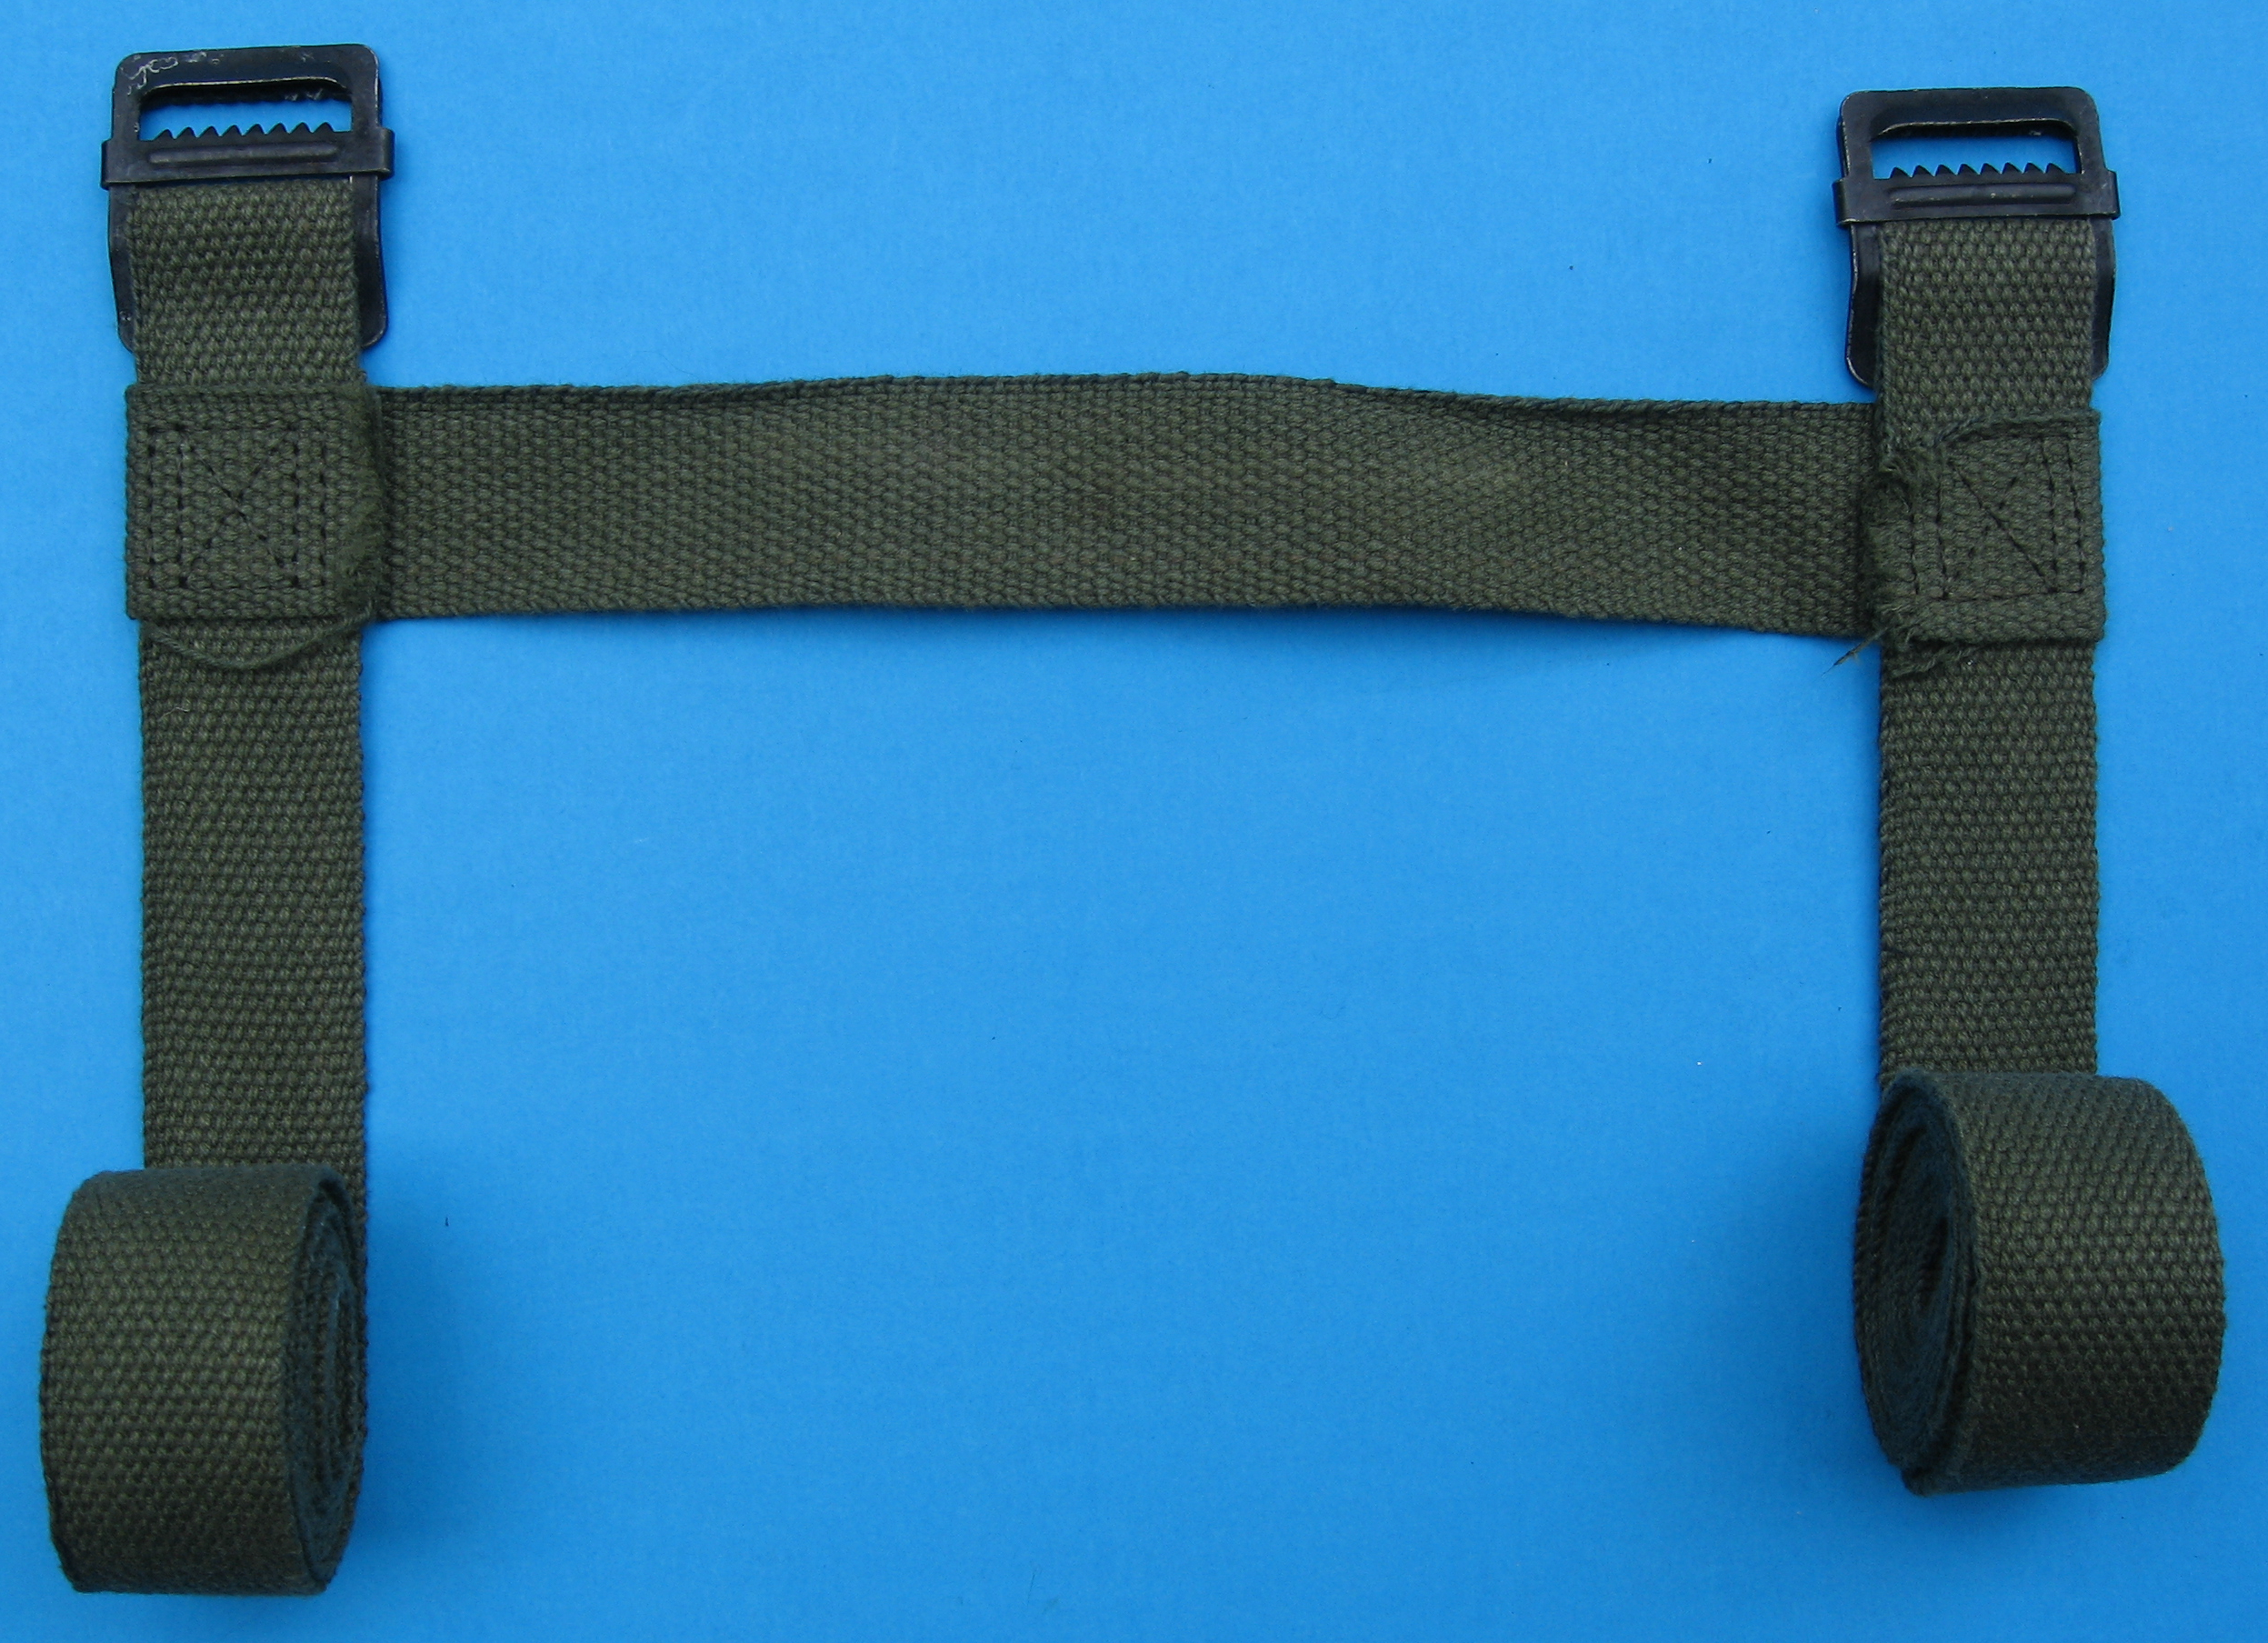 File:Military gear strap 001 jpg - Wikimedia Commons